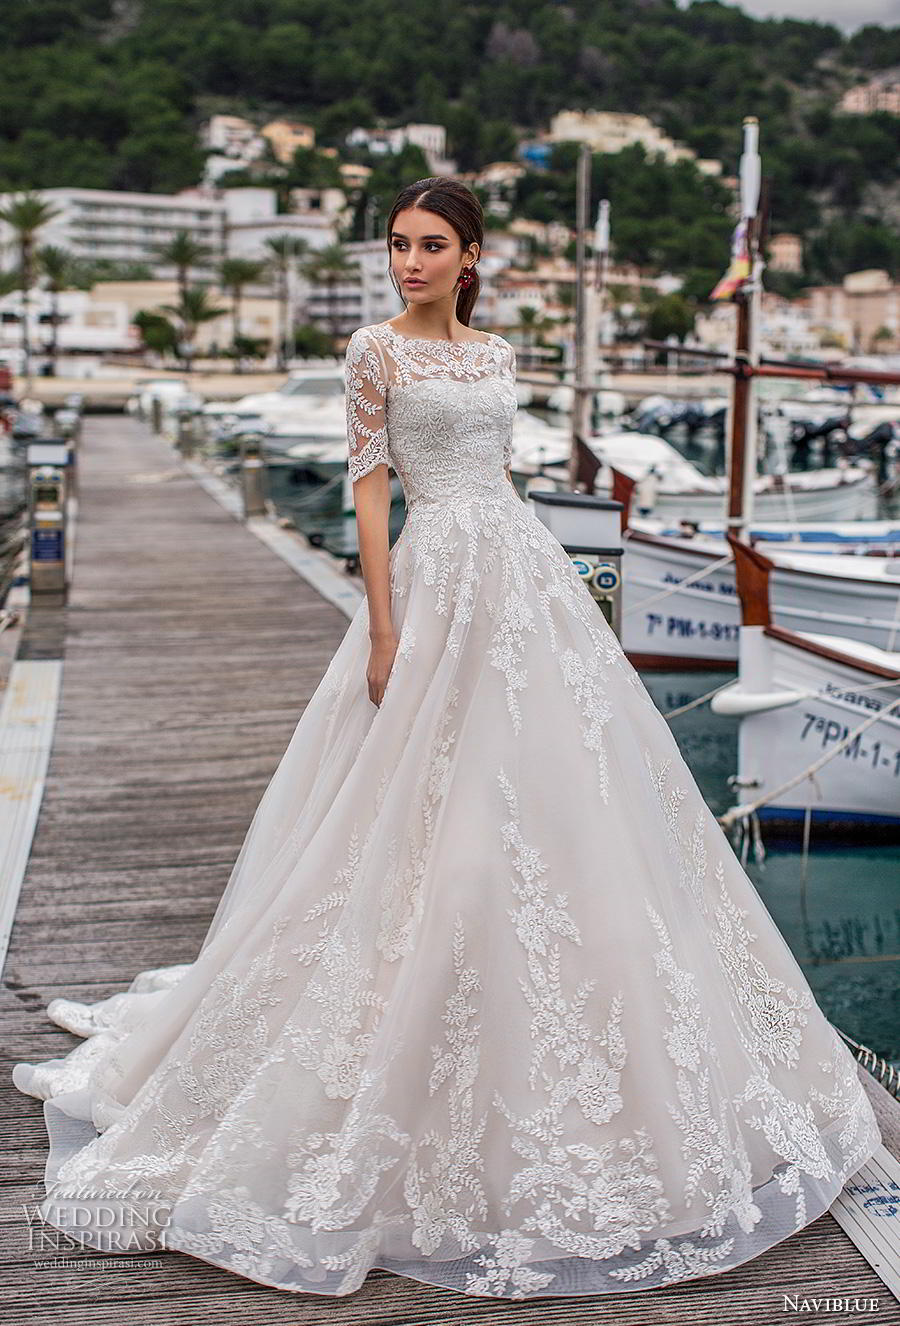 naviblue 2019 bridal half sleeves illusion bateau sweetheart neckline heavily embellished bodice hem a line wedding dress lace back chapel train (14) mv